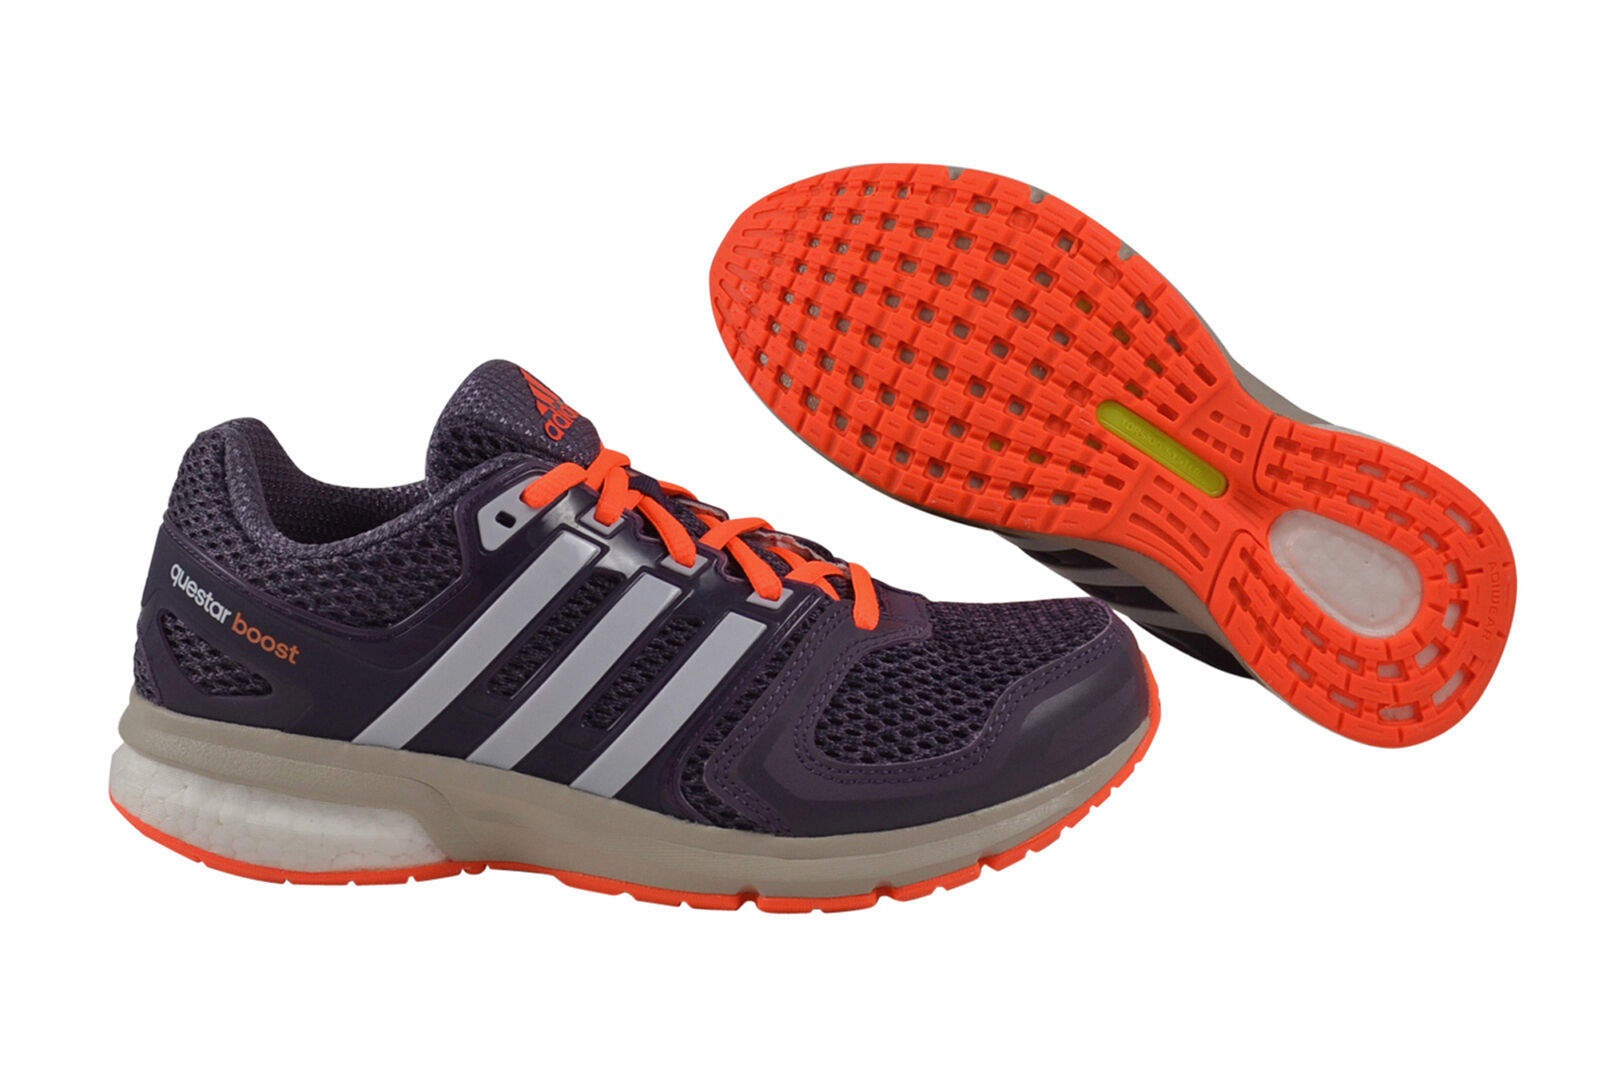 Adidas Questar Boost daSie lila Orange Trainers schuhe b33468